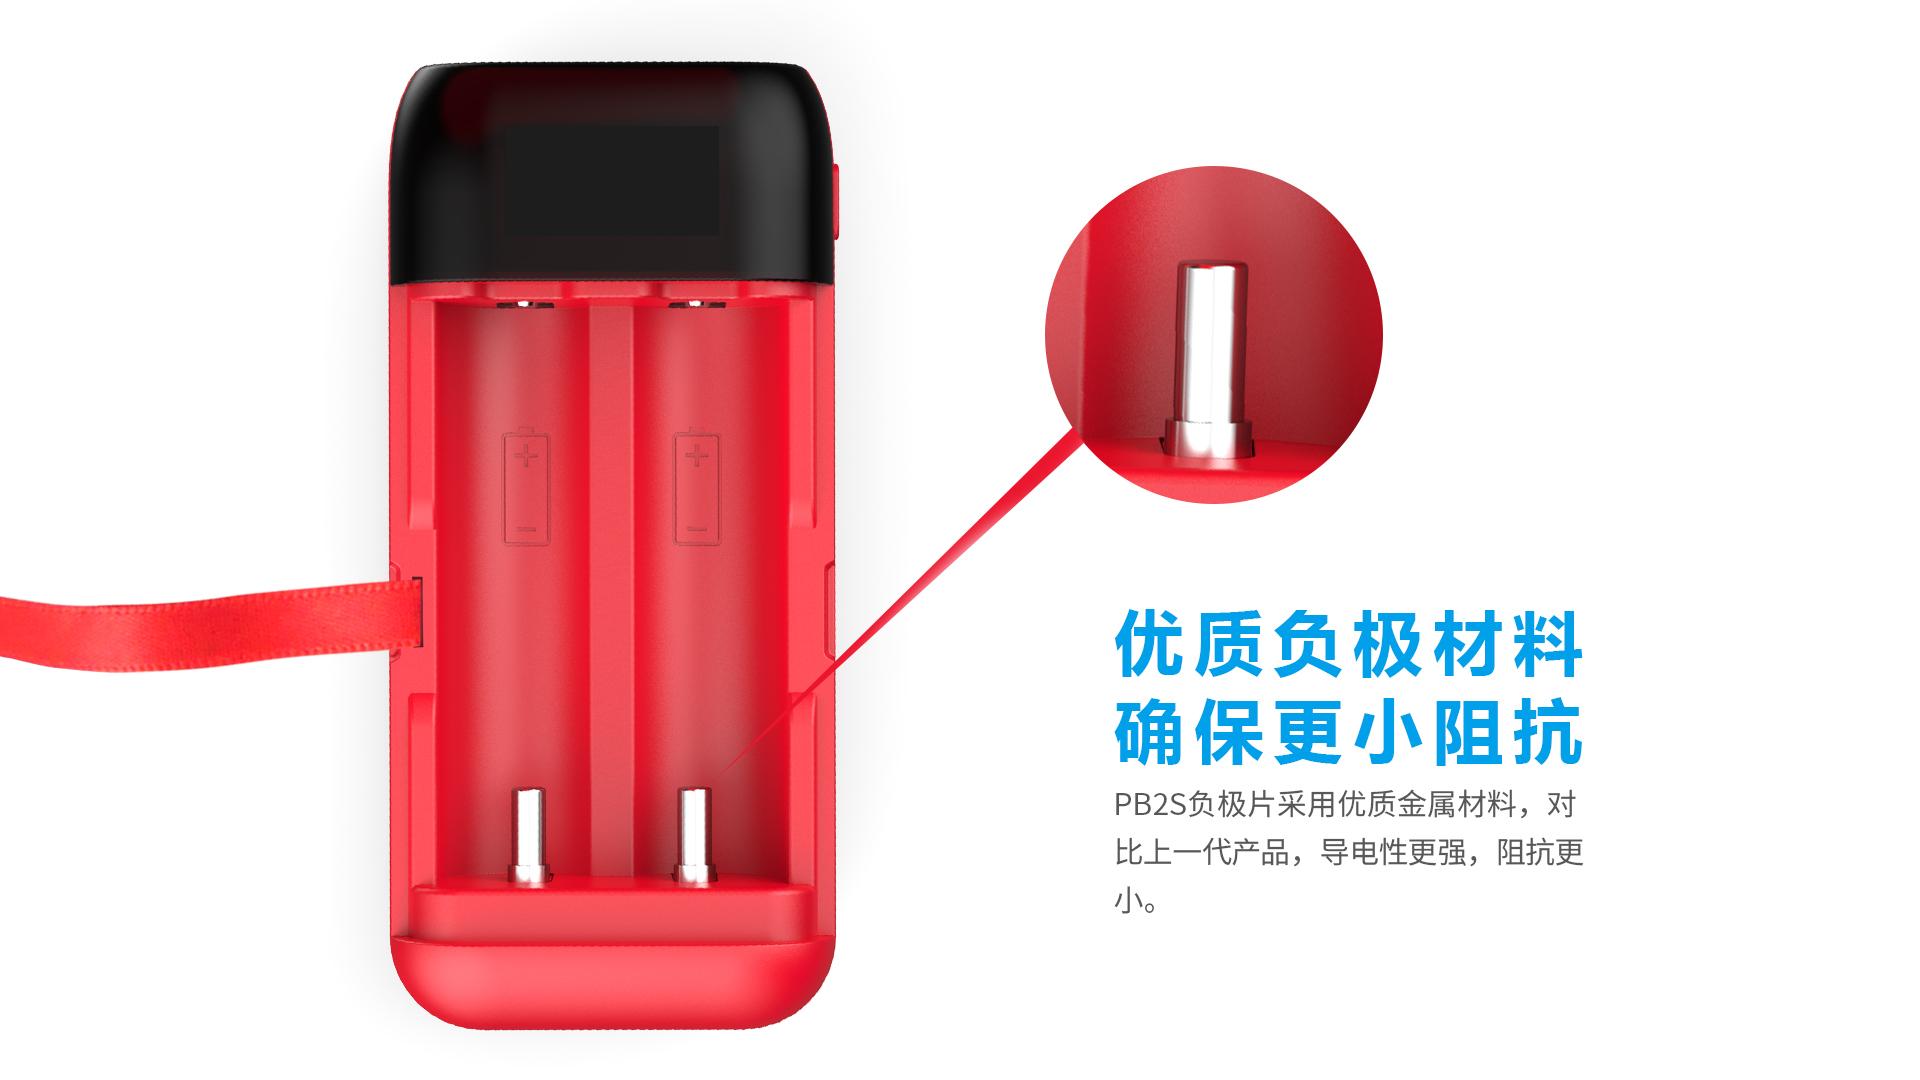 PB2S智能充电器